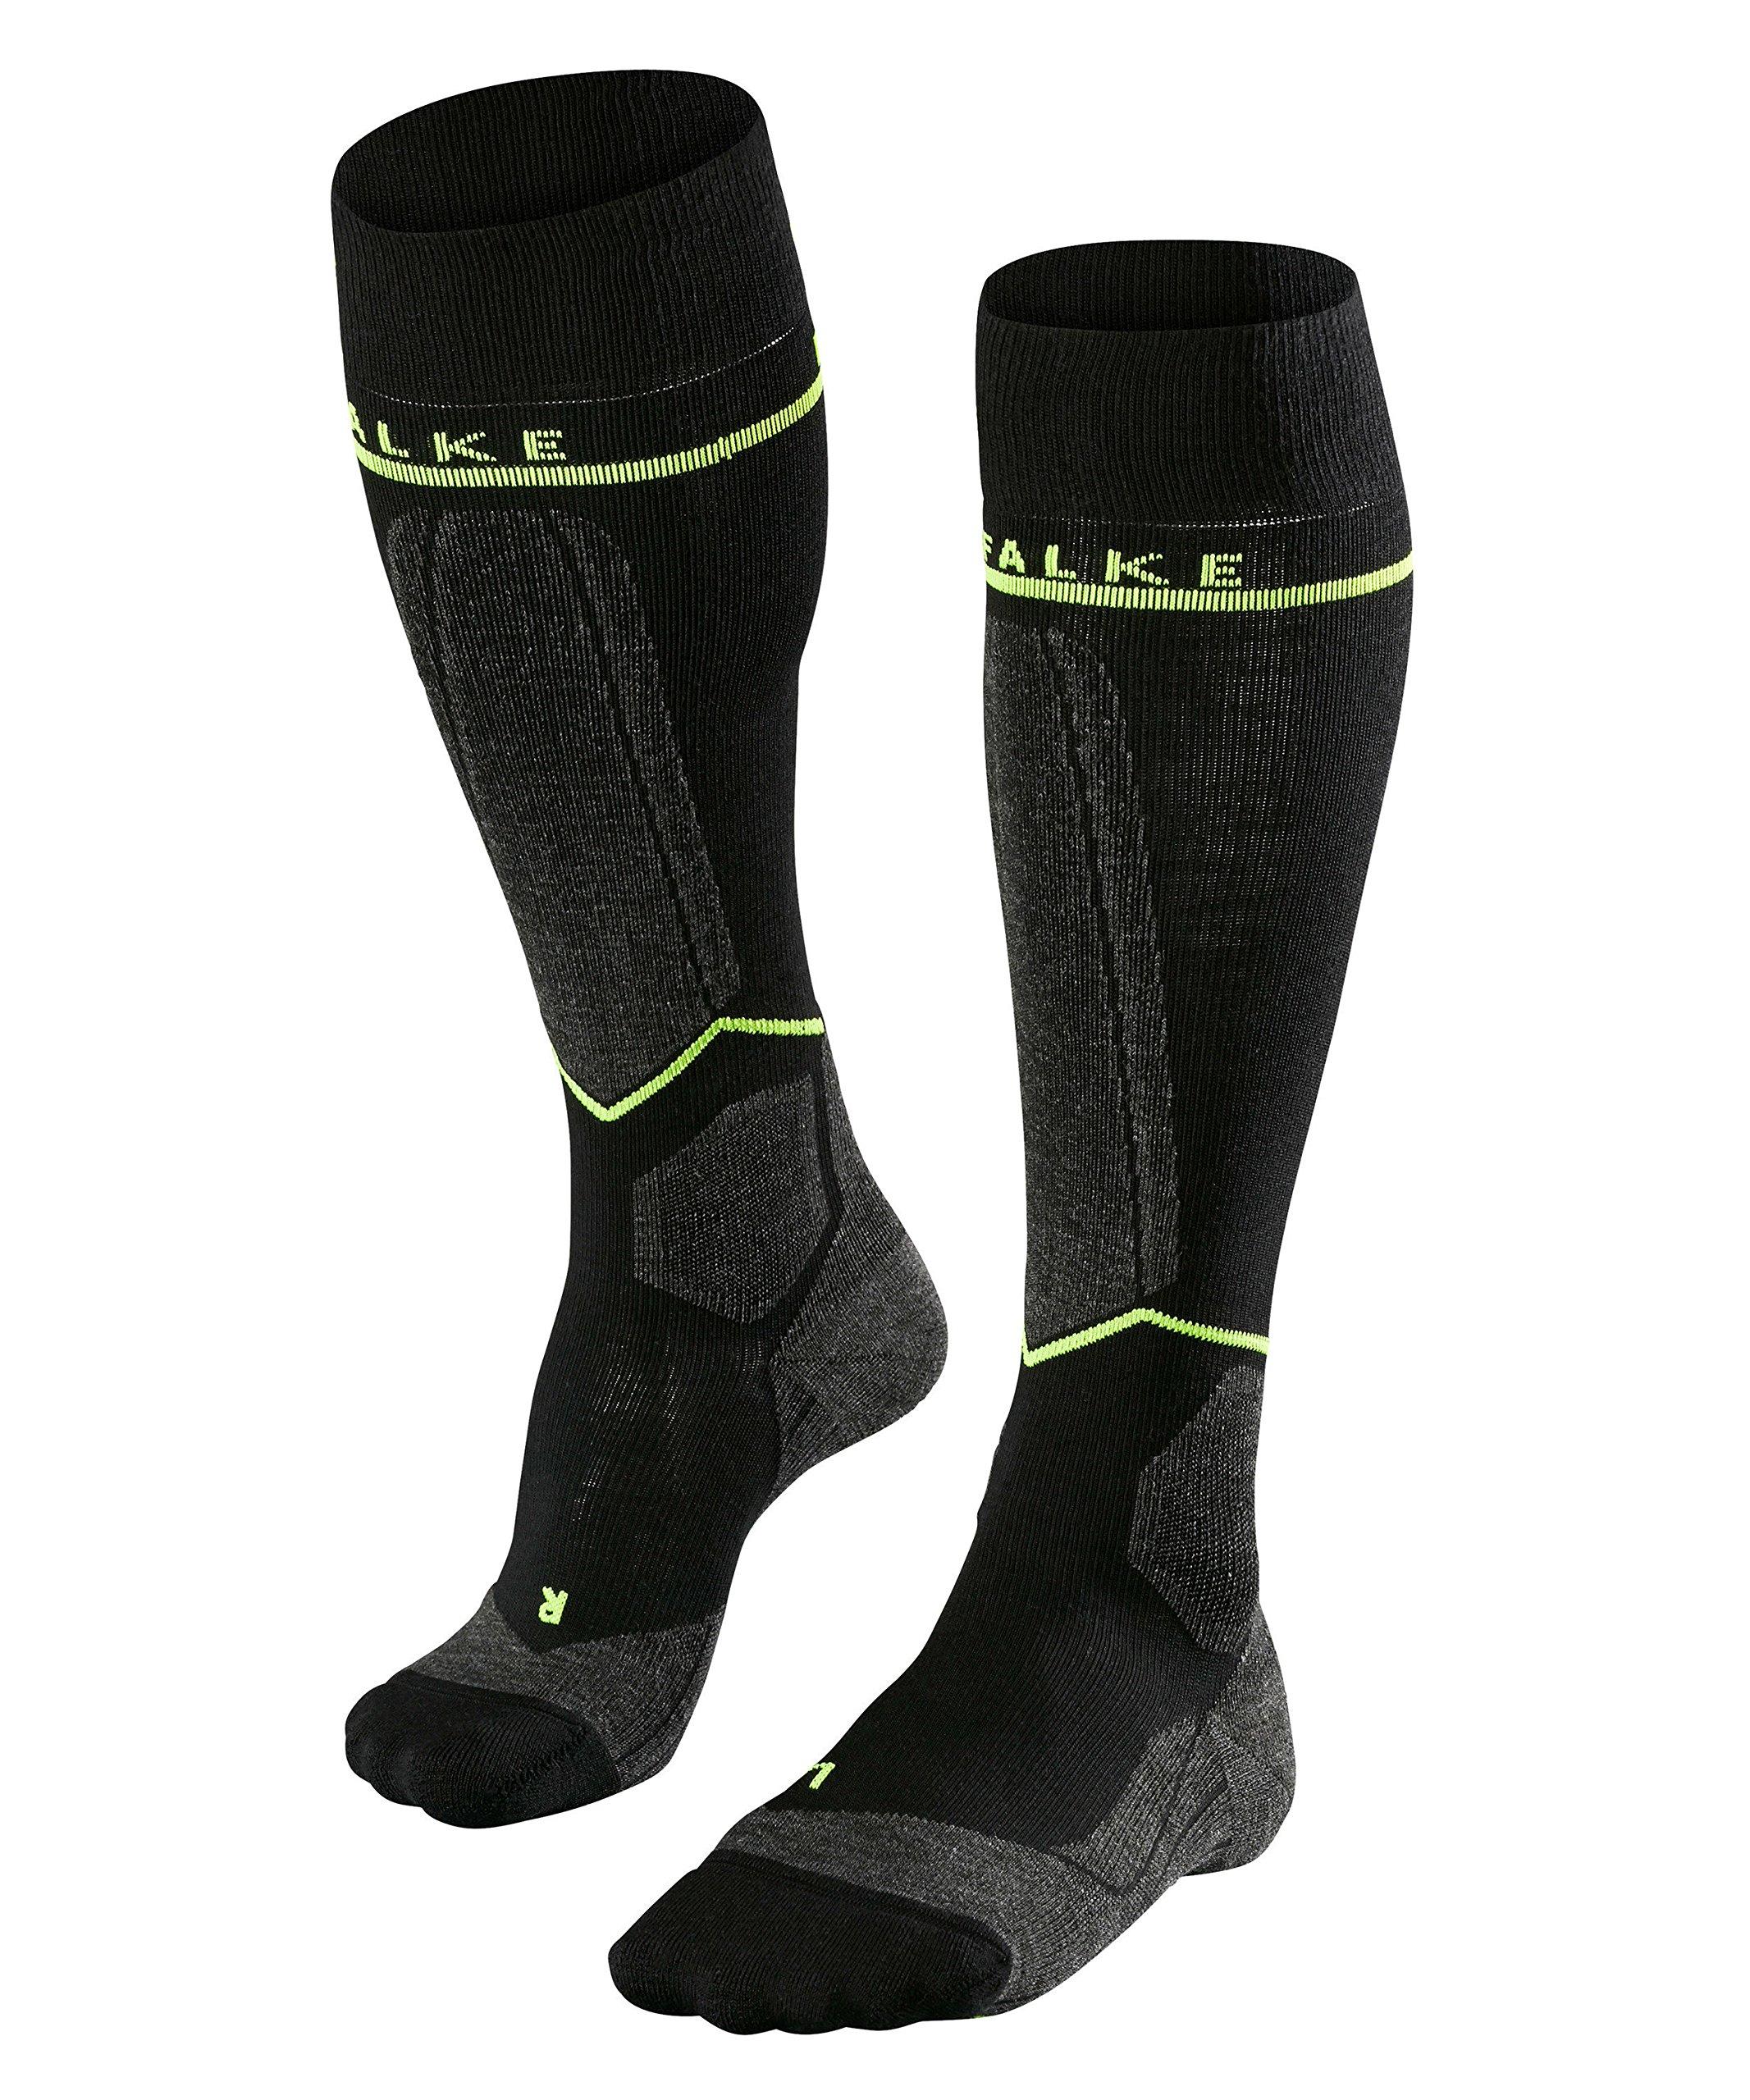 Falke Men's SK Energizing-Compression Ski Sock-32% Wool, black lightning, 39-42 W3 by FALKE